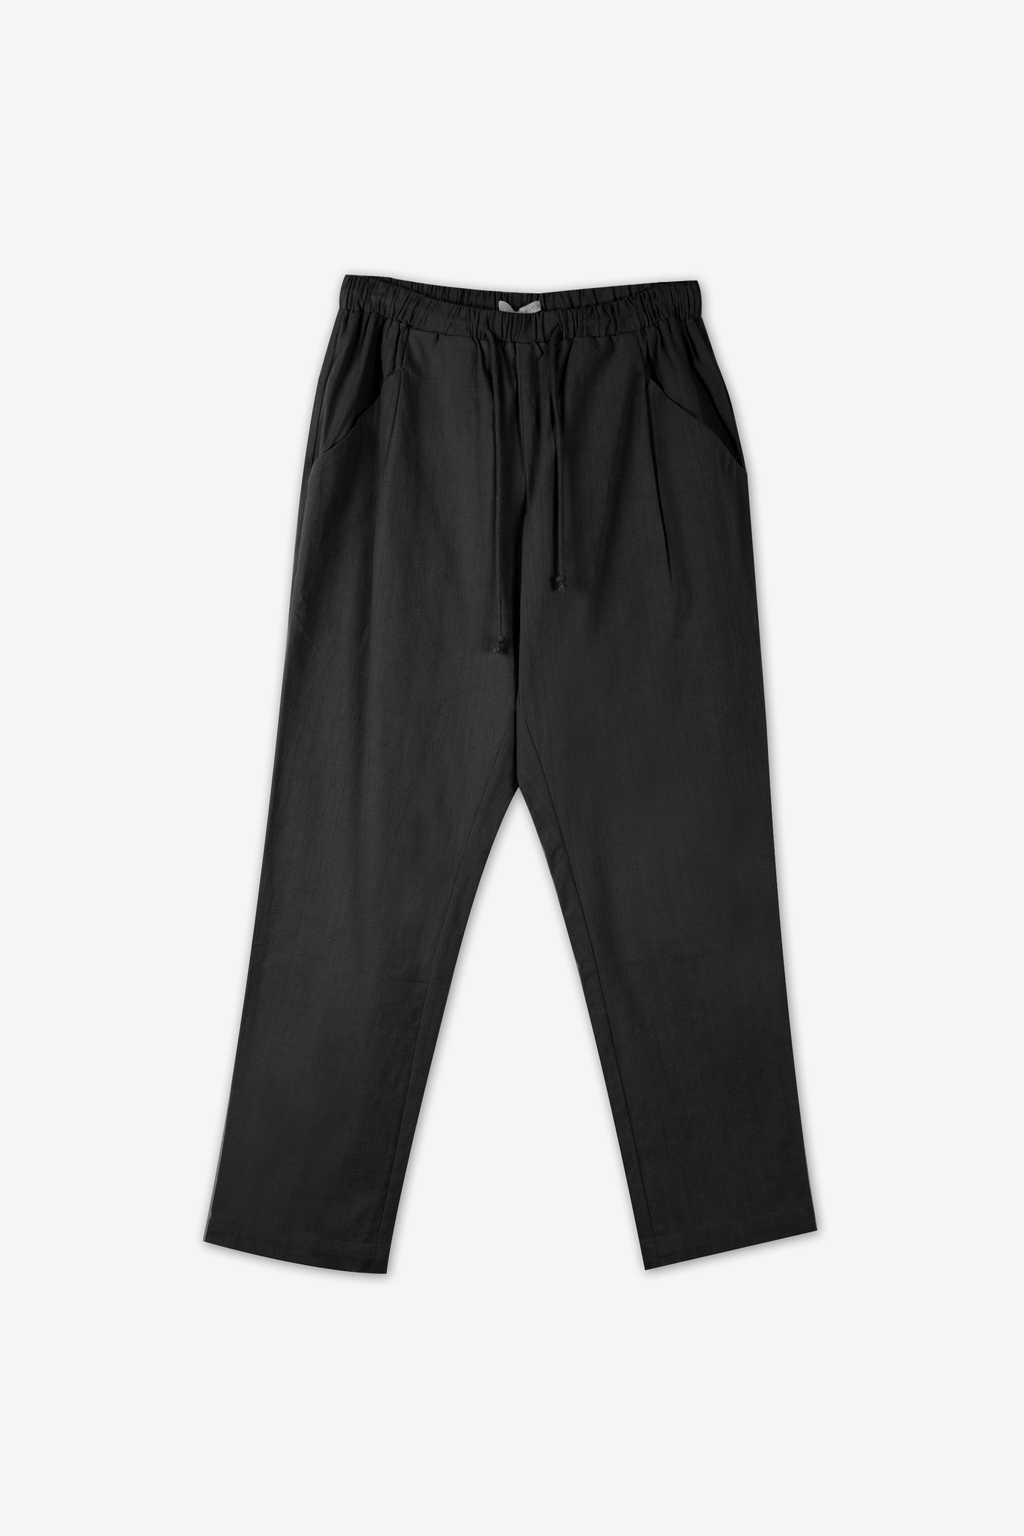 Pant 1087 Black 6